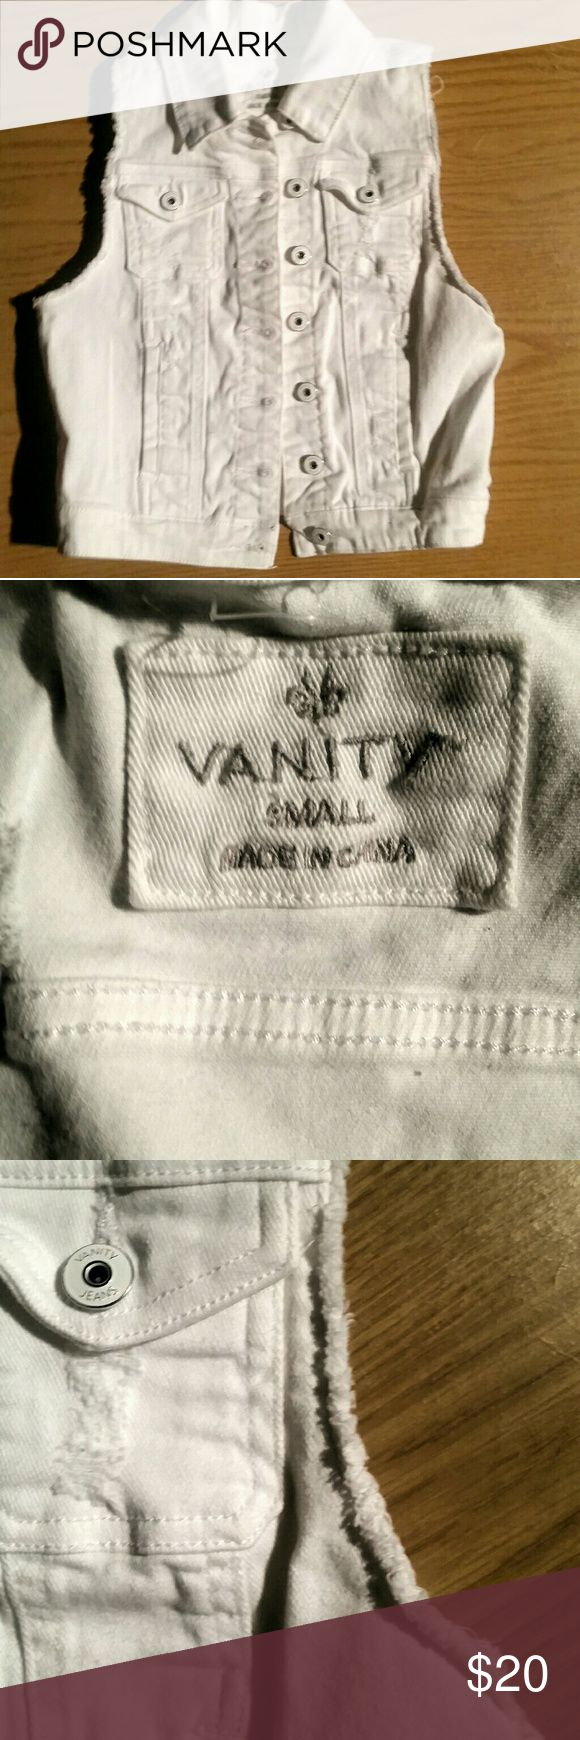 White Denim Vest by VANITY NWOT 10/10 condition. Smoke free home.sz small Vanity Jackets & Coats Vests